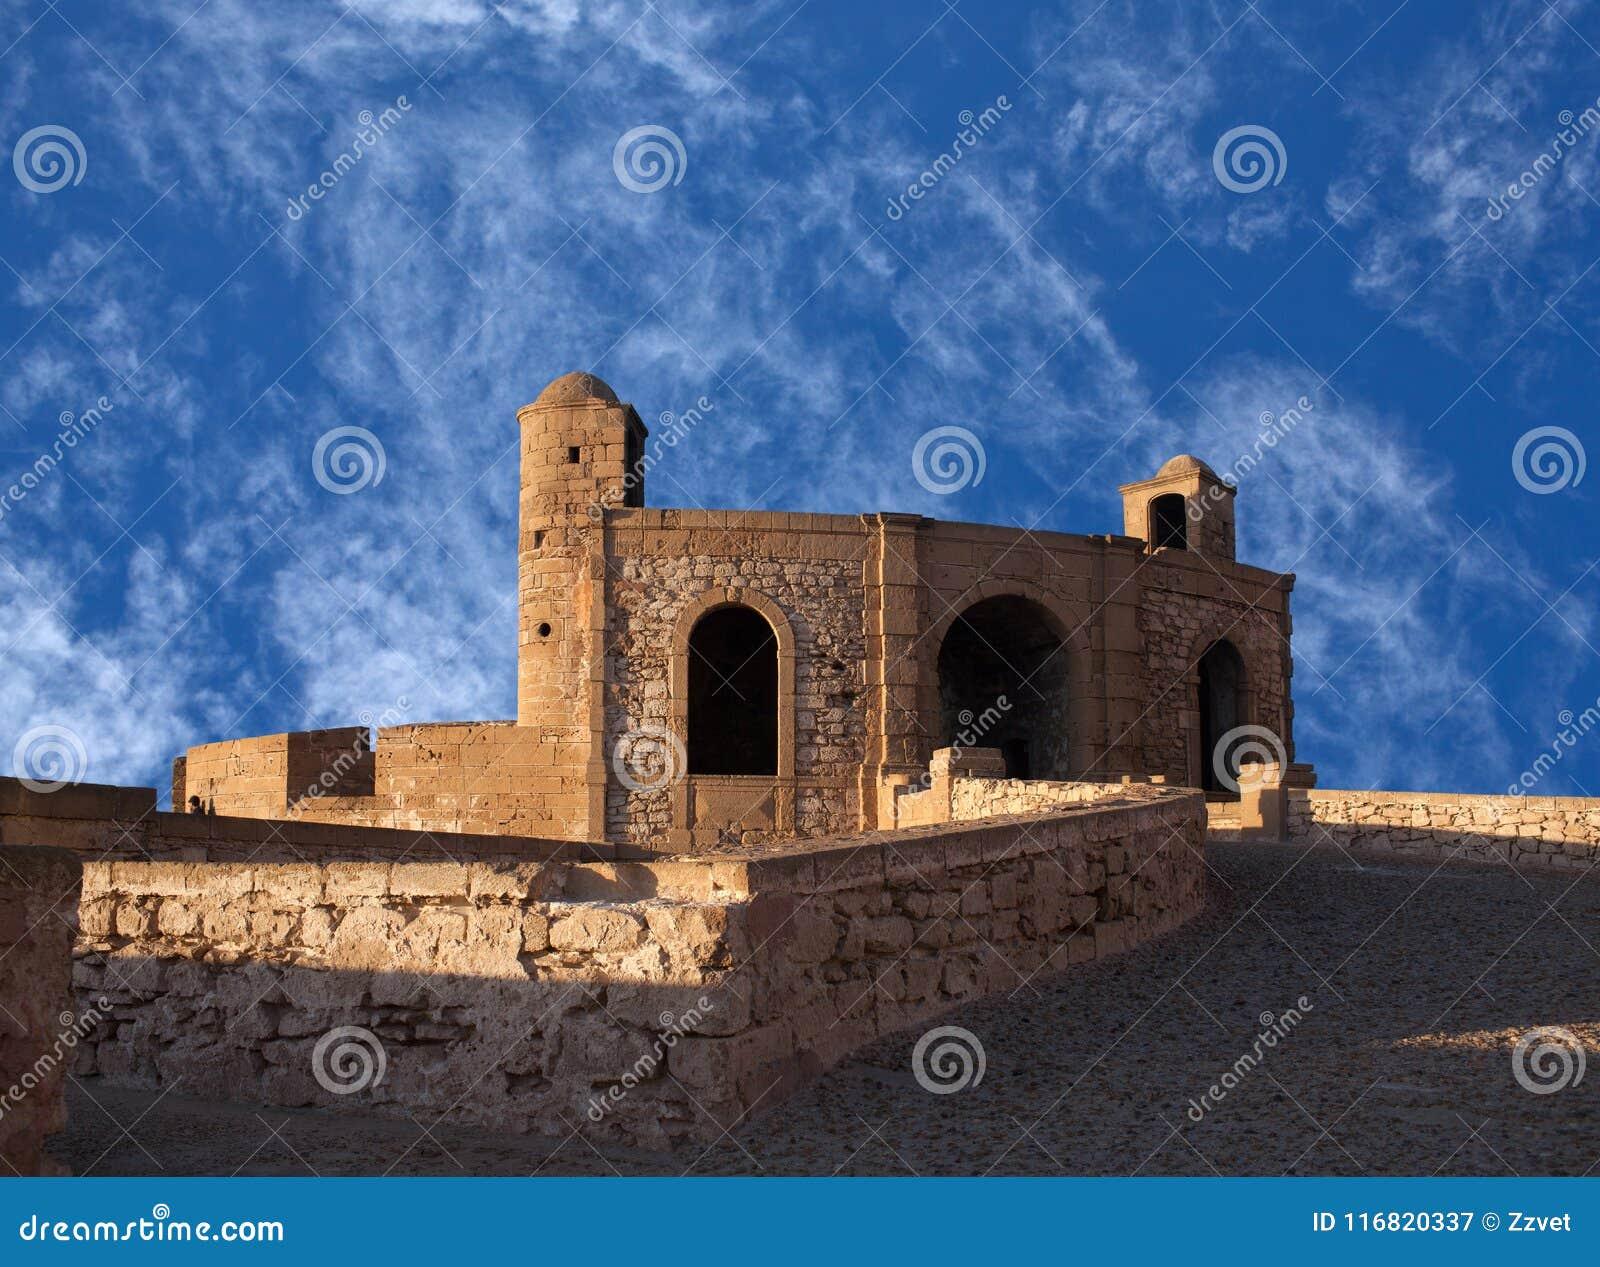 Essaouira-Festung in Marokko auf der Atlantikküste, Afrika